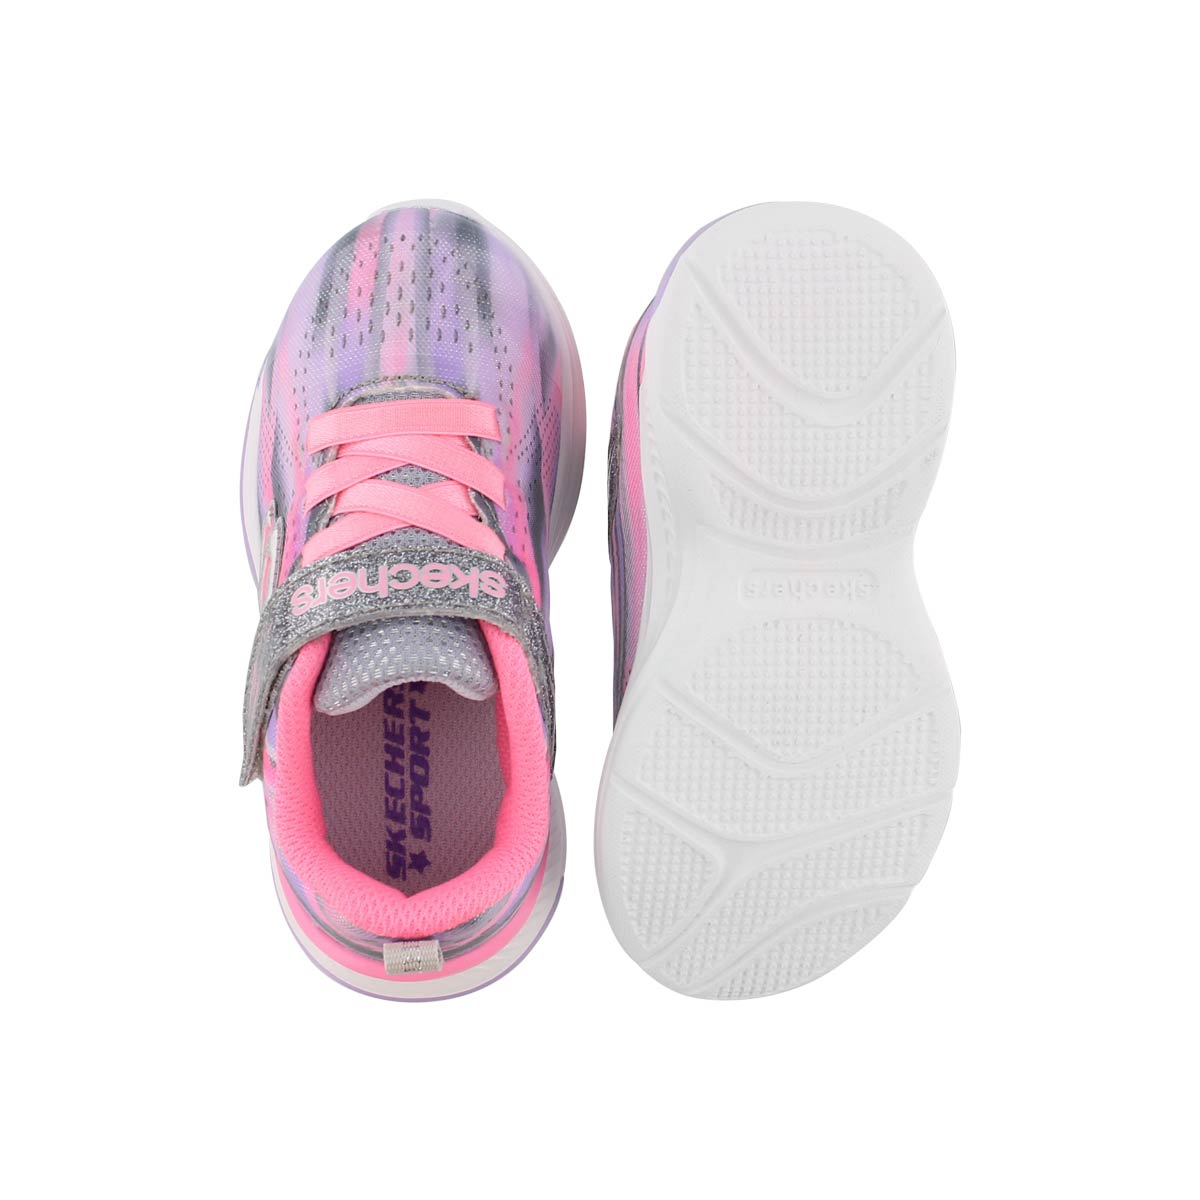 Infs-g Jumpin Jams multi streaks sneaker